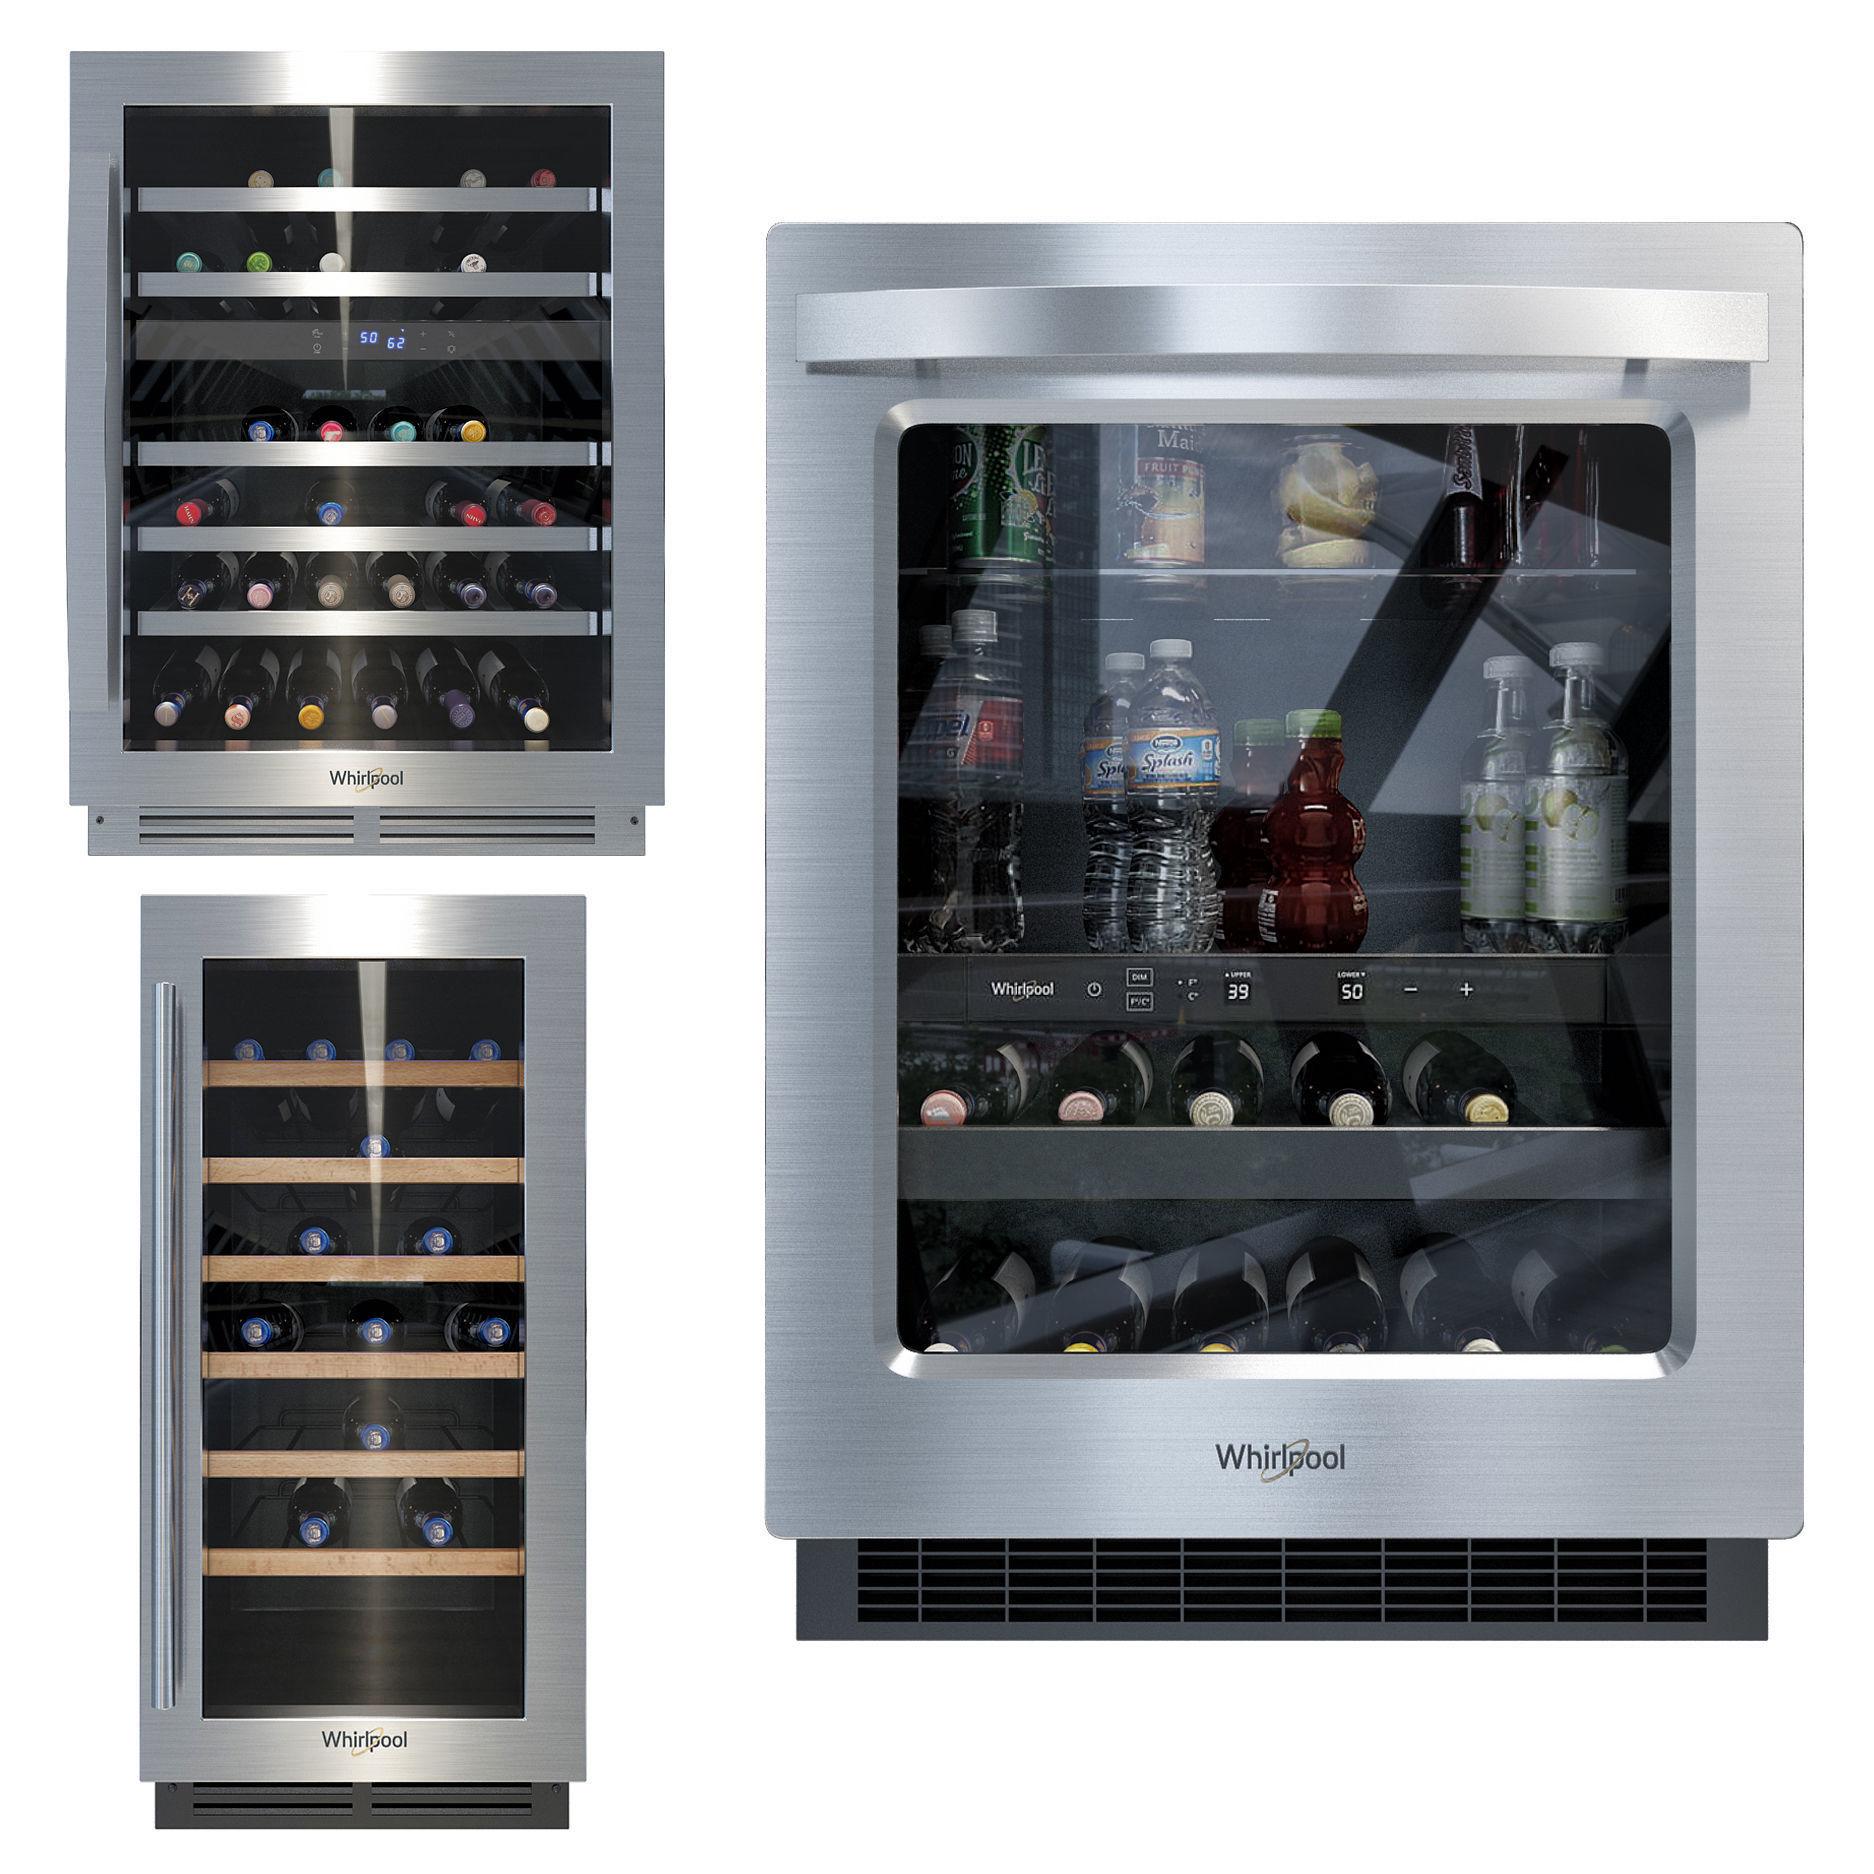 Whirpool Wine Refrigerators